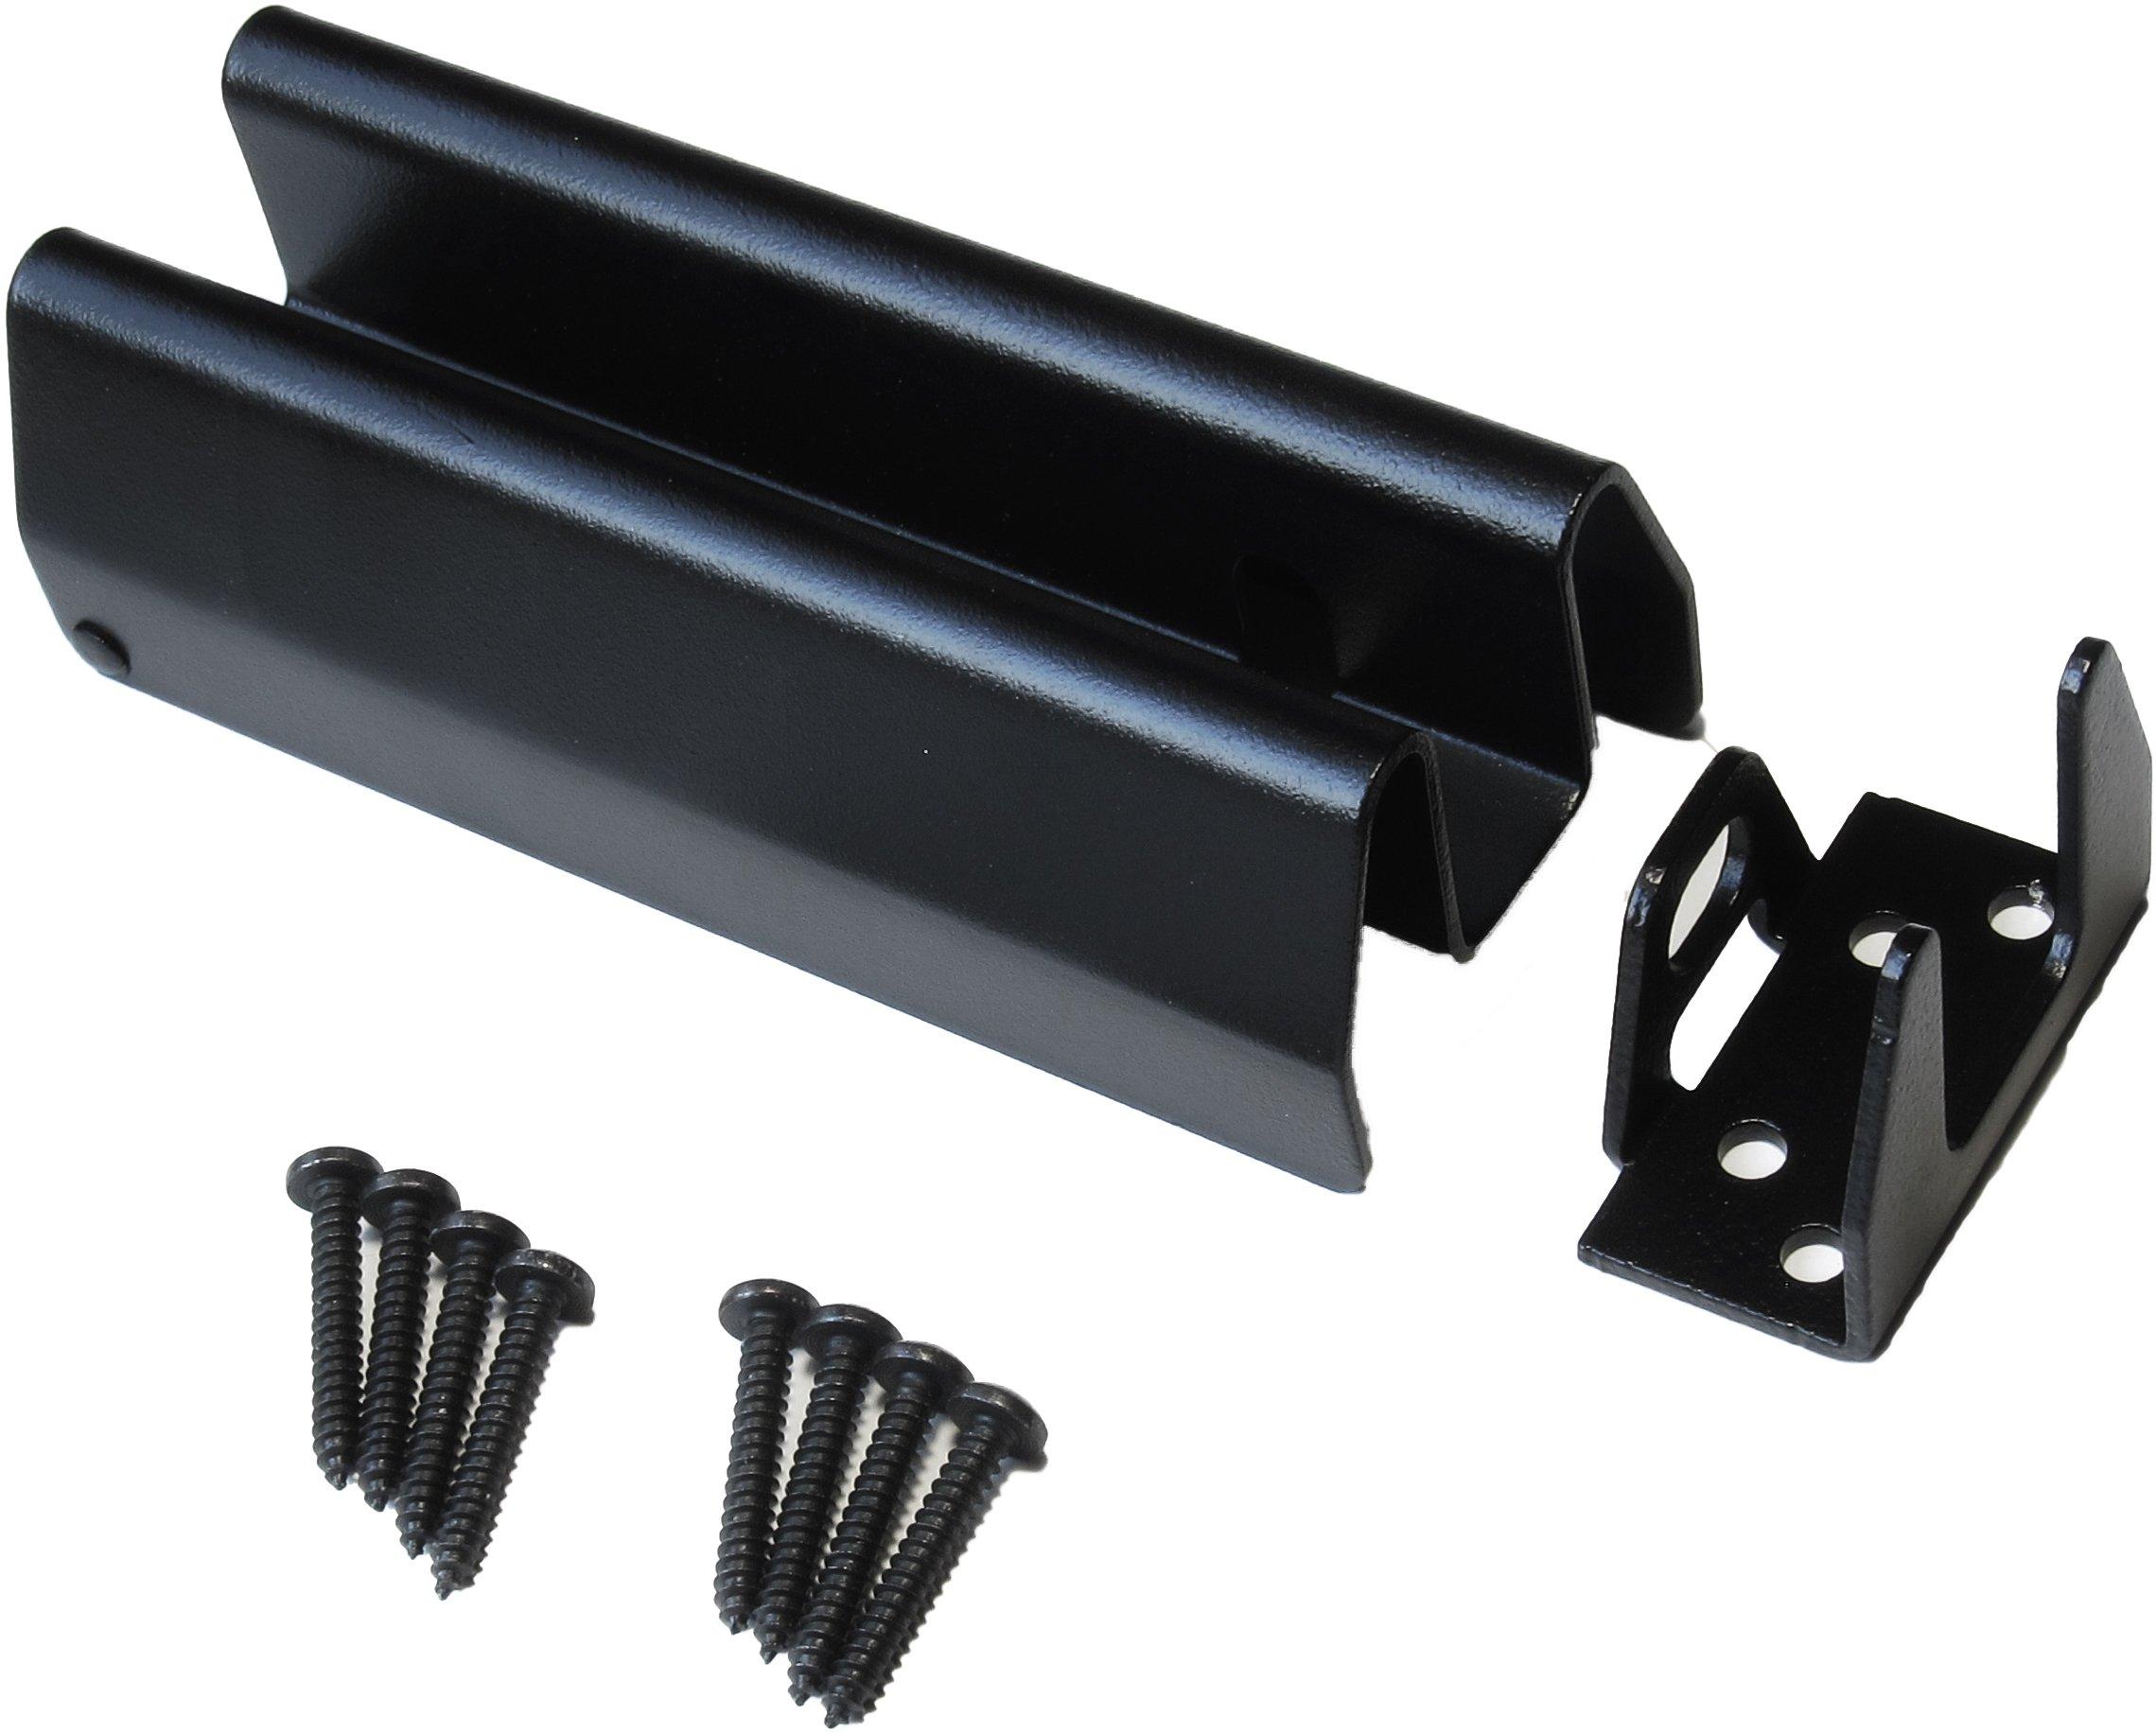 Heavy Metal Tamper Proof 6'' Heavy Duty Security Hasp - Stops Bolt Cutters - Black Powder Coat